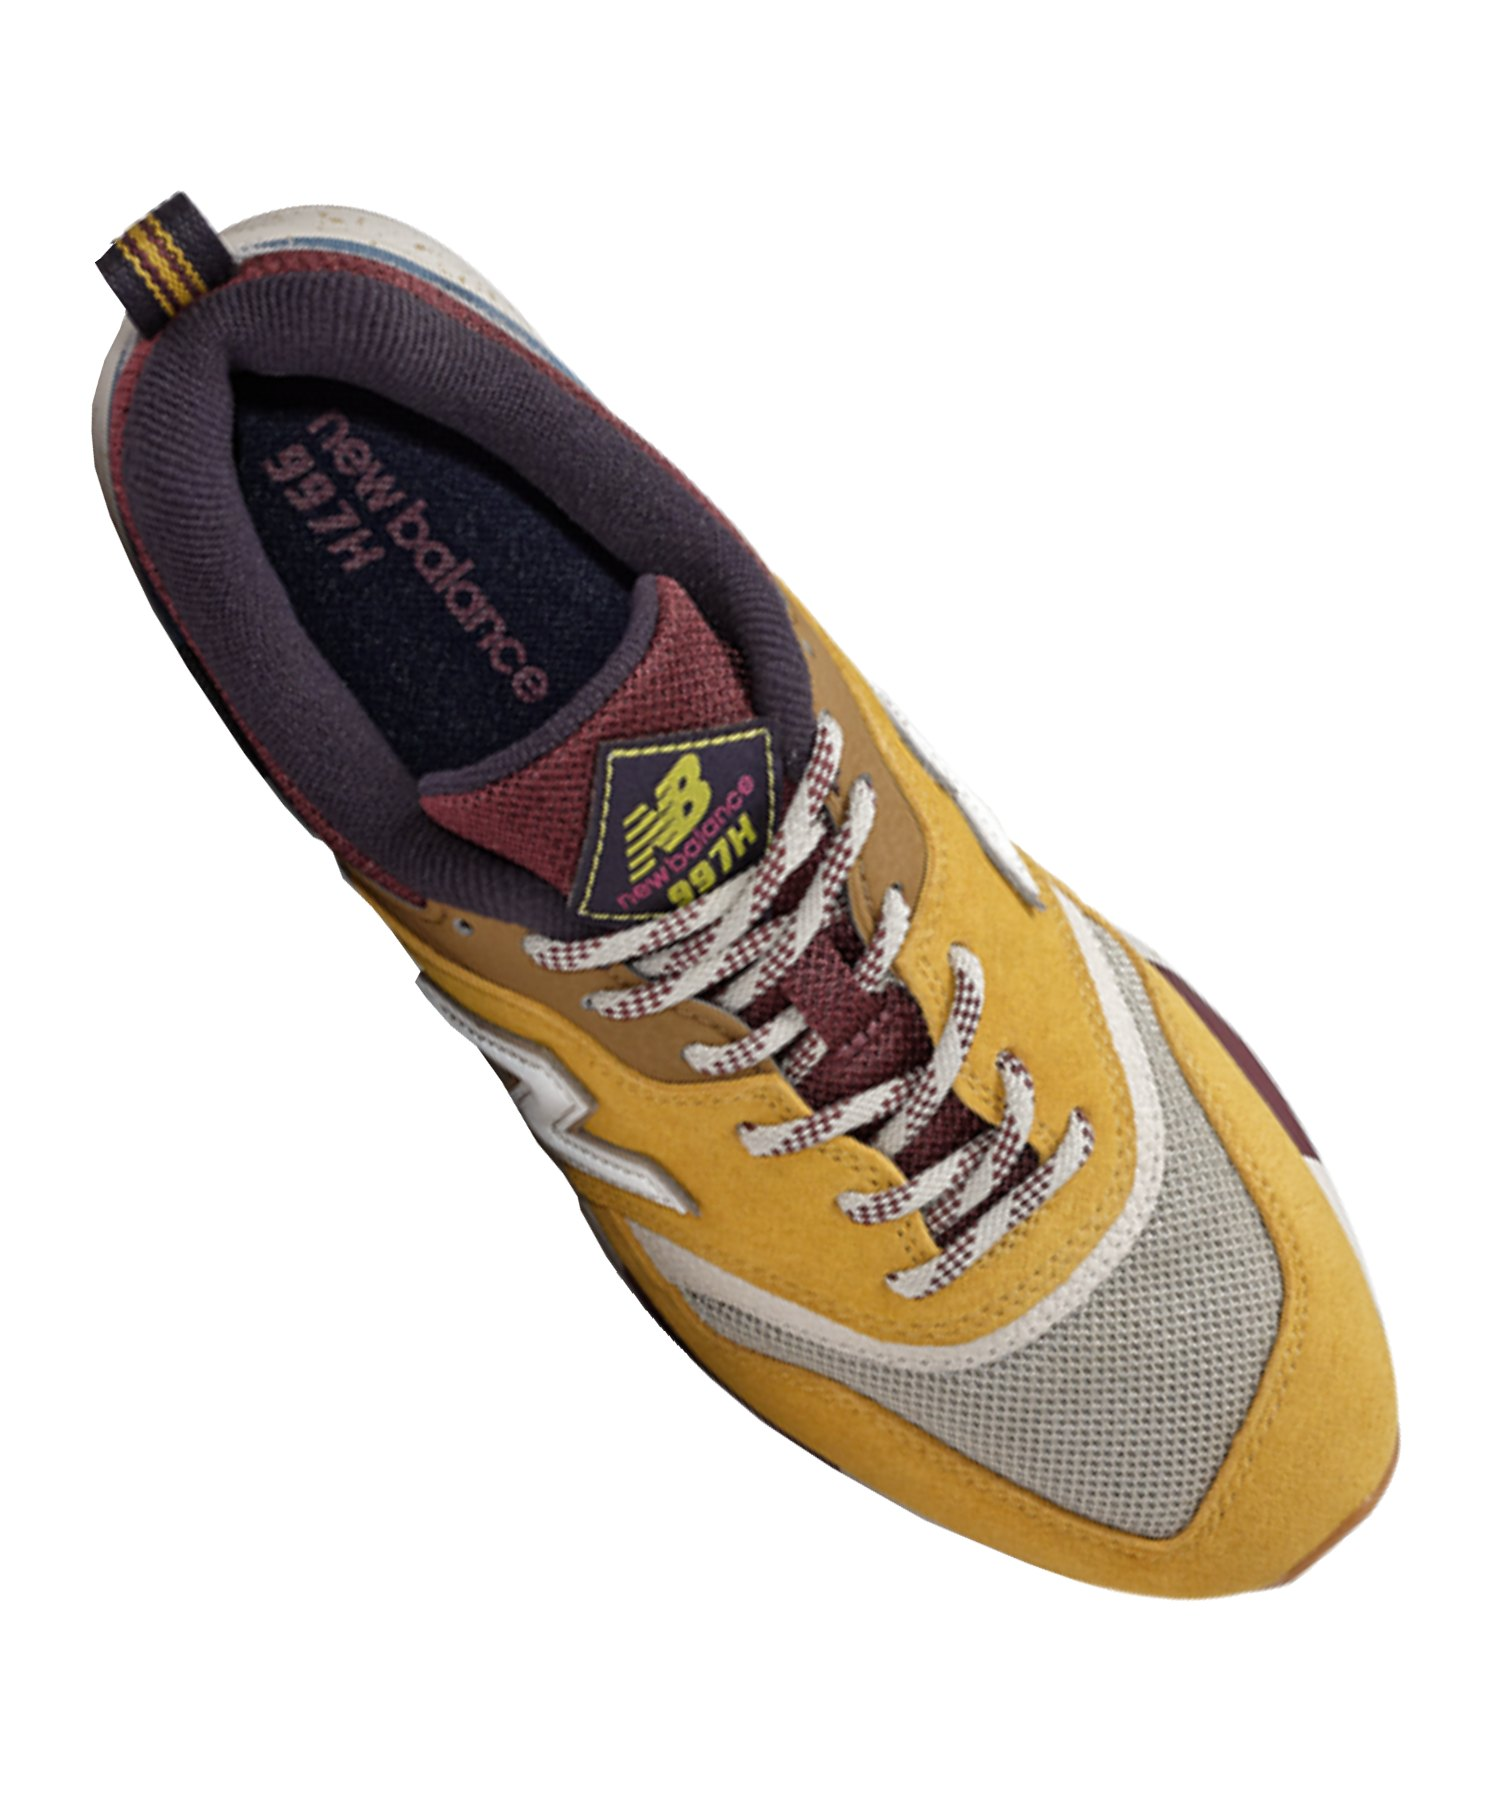 New Balance CW997 B Sneaker Damen Gelb F07